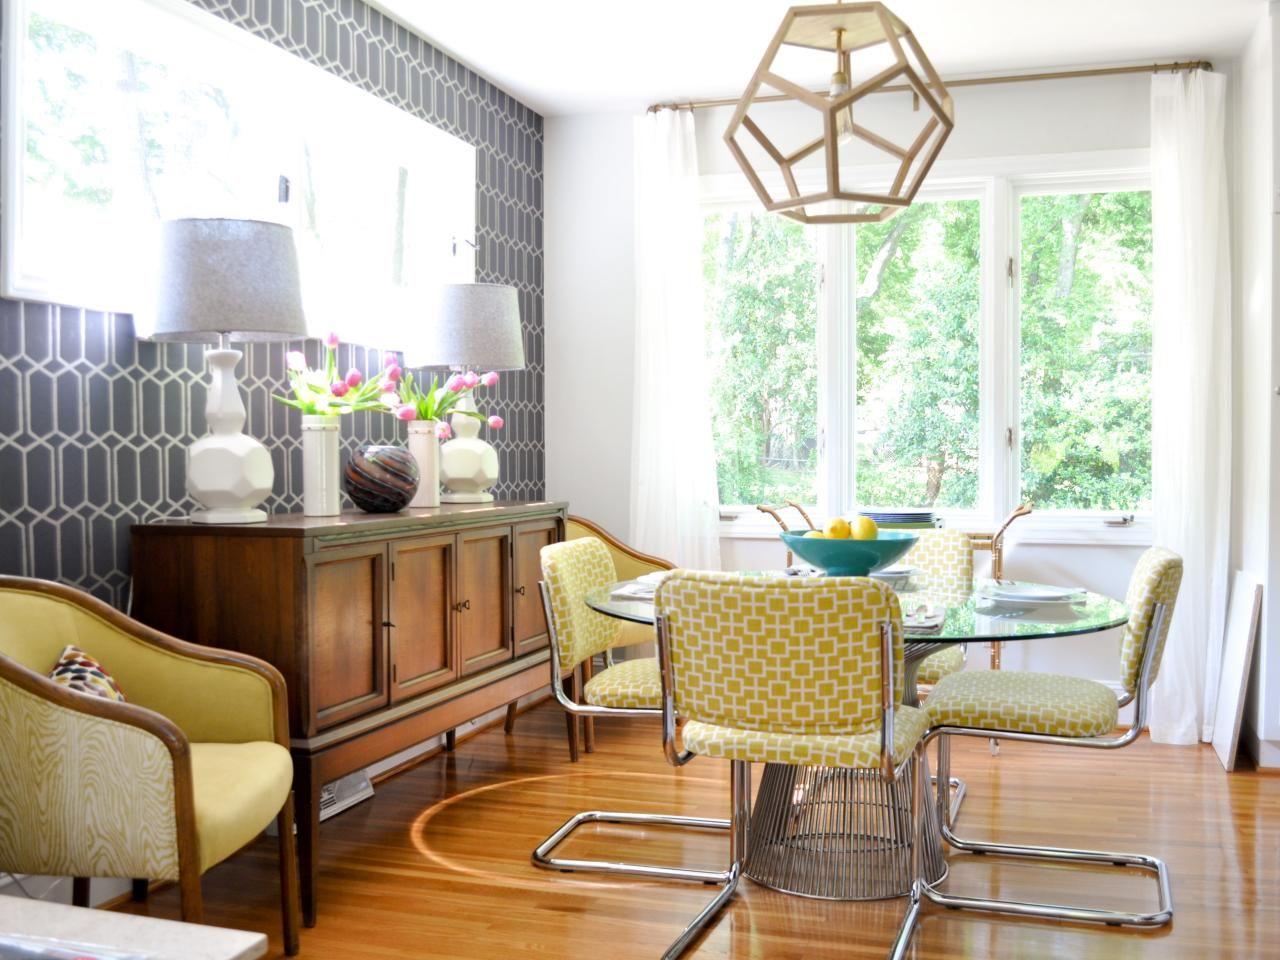 Perfectly Midcentury Mod Vibrant Midcentury Modern Dining Room On Hgtv